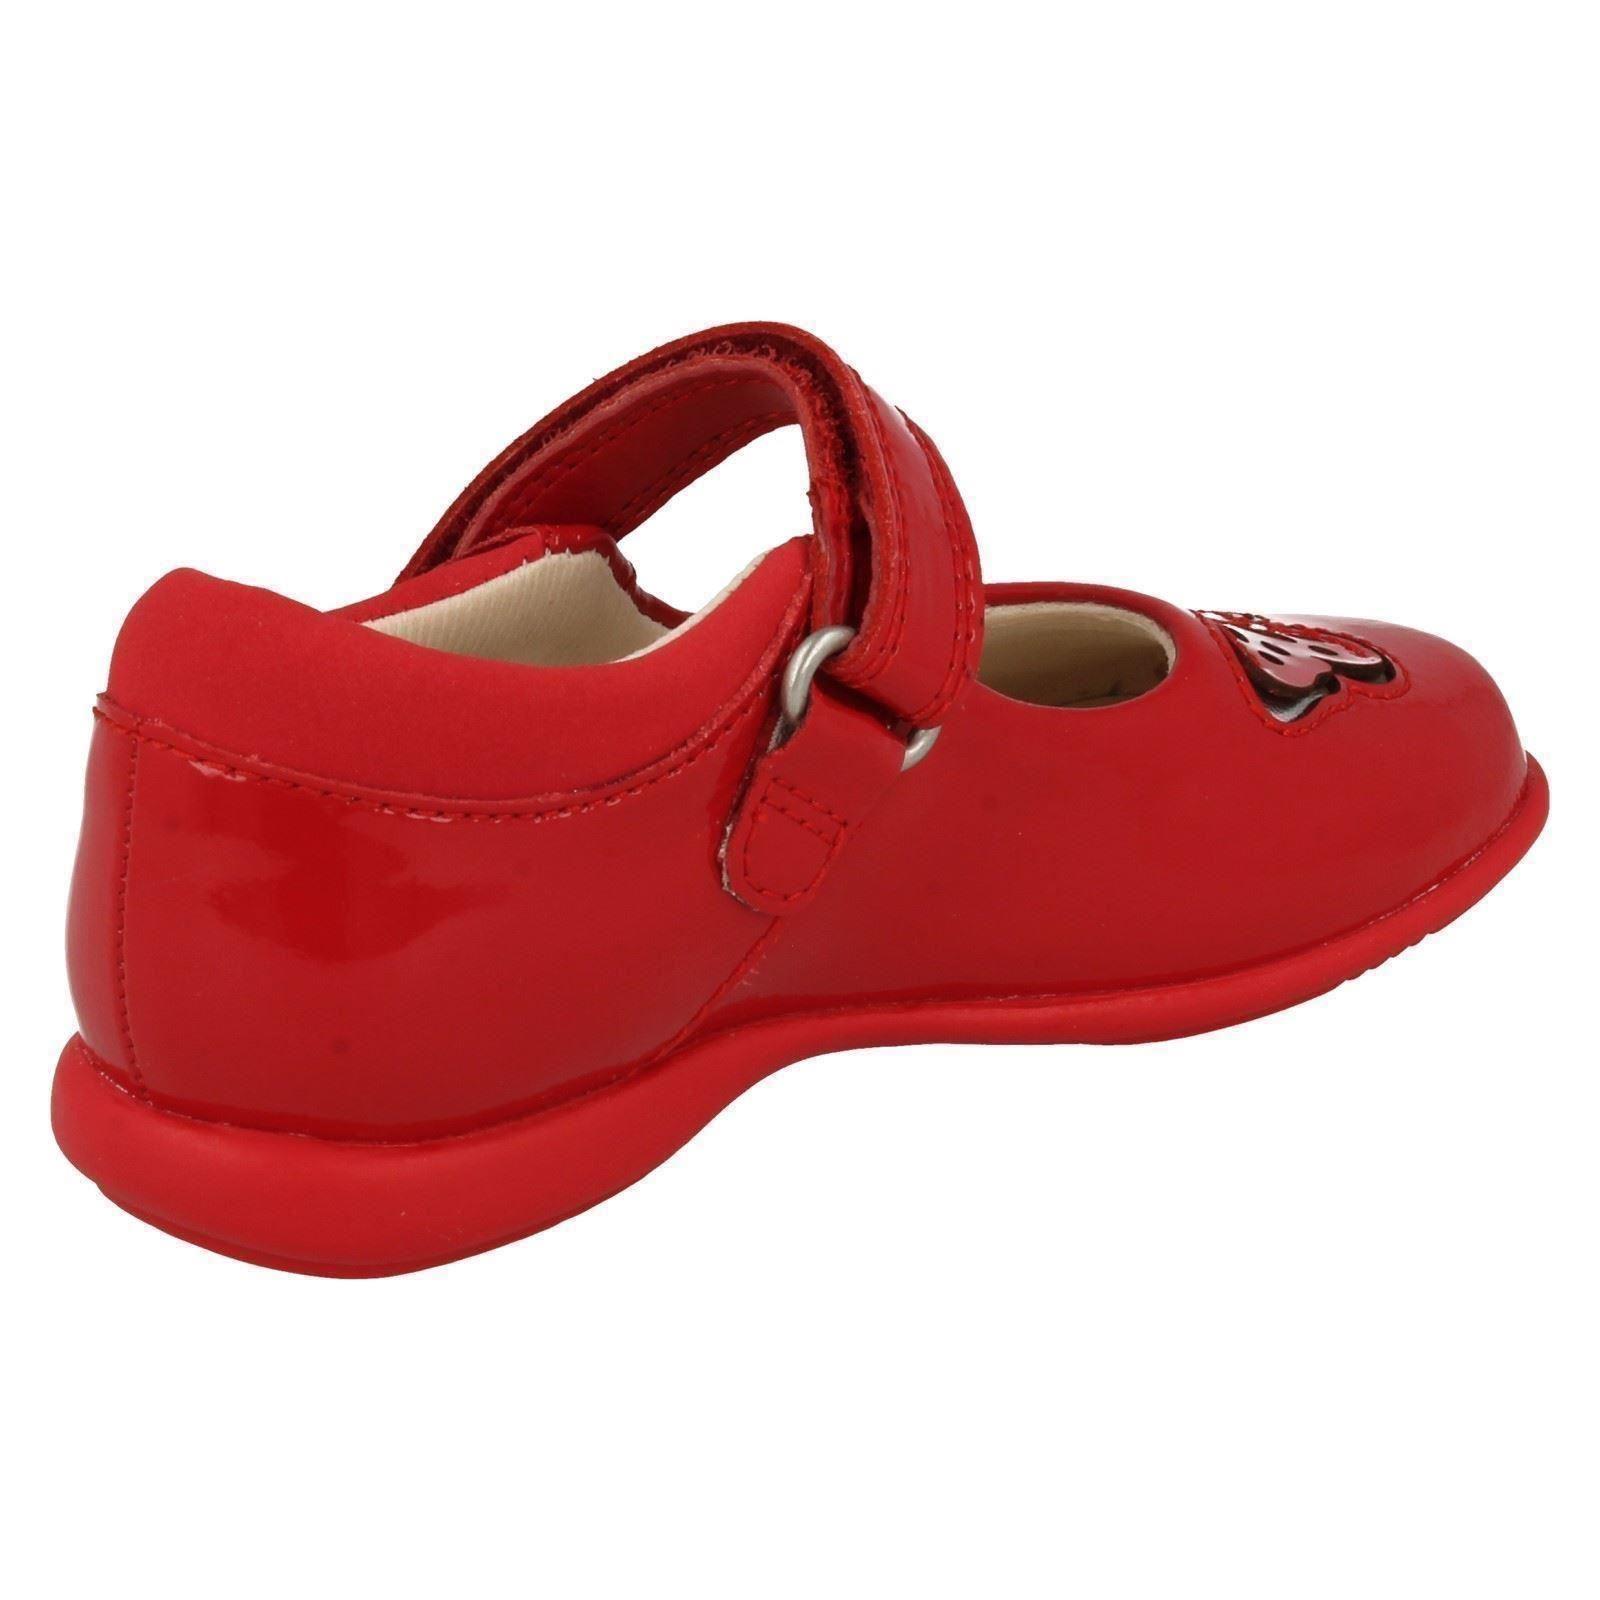 Girls Clarks Casual Light Up Shoes Trixi Wish